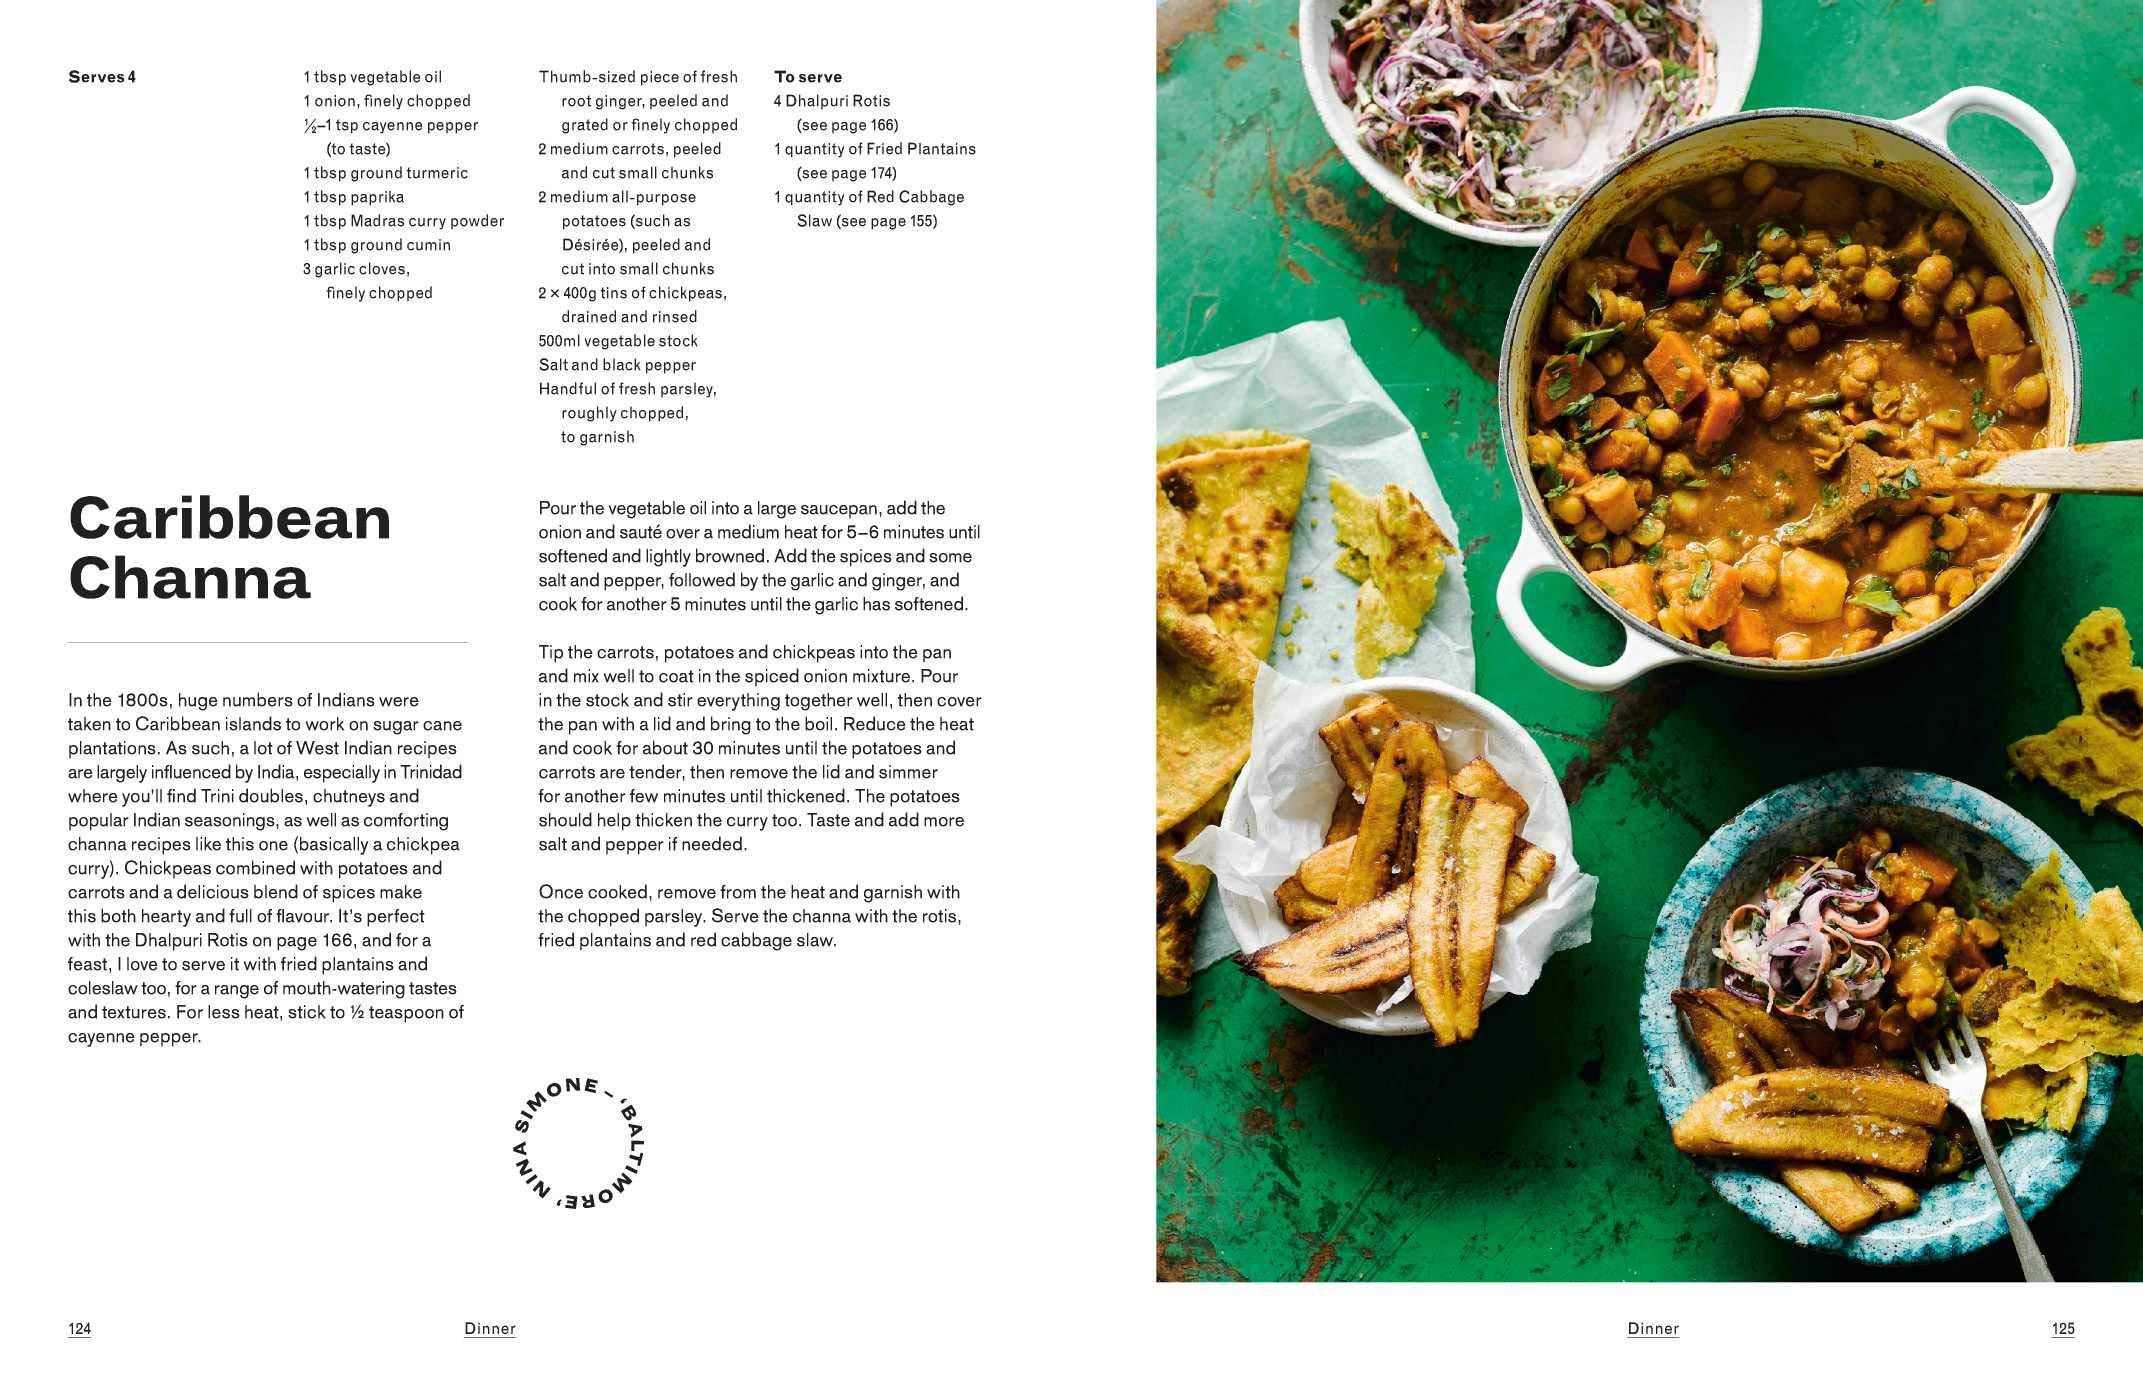 Rachel Ama's Vegan Eats: Tasty plant-based recipes for every day 8